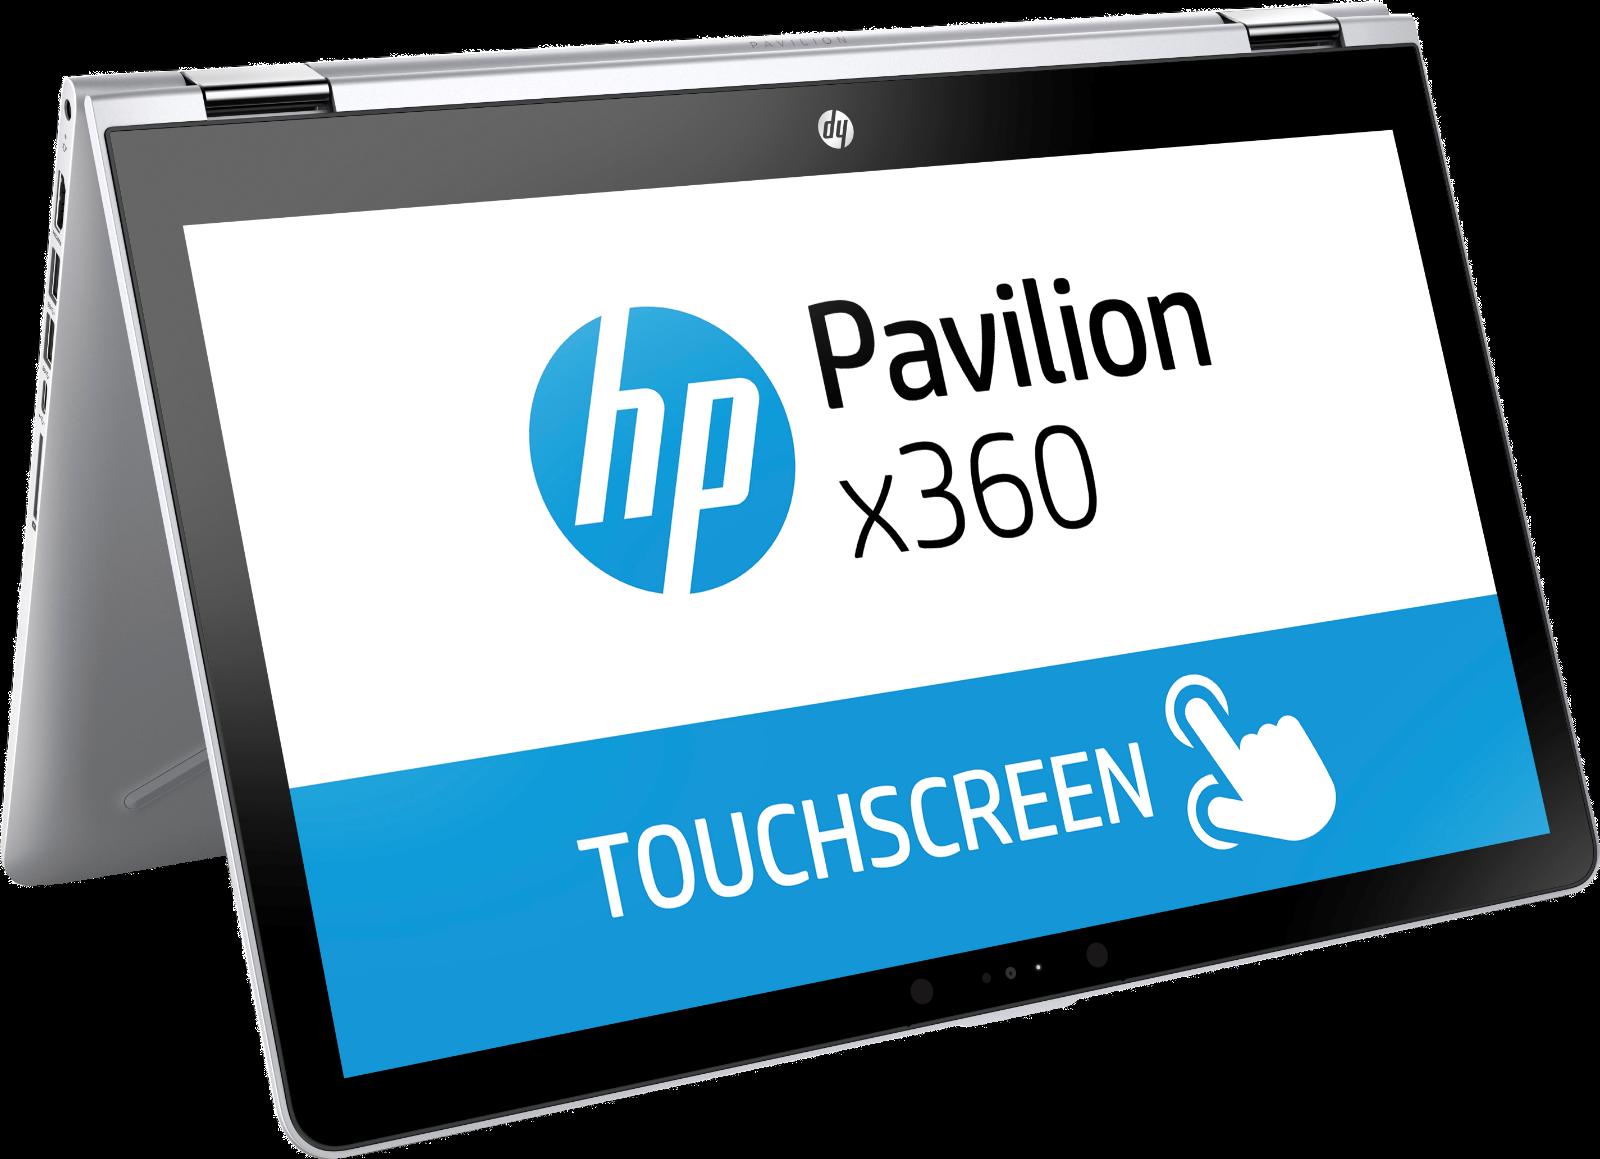 Hp Pavilion X360 15-br006na Touchscreen Laptop - Intel I3-7100u 8gb 1tb Hdd